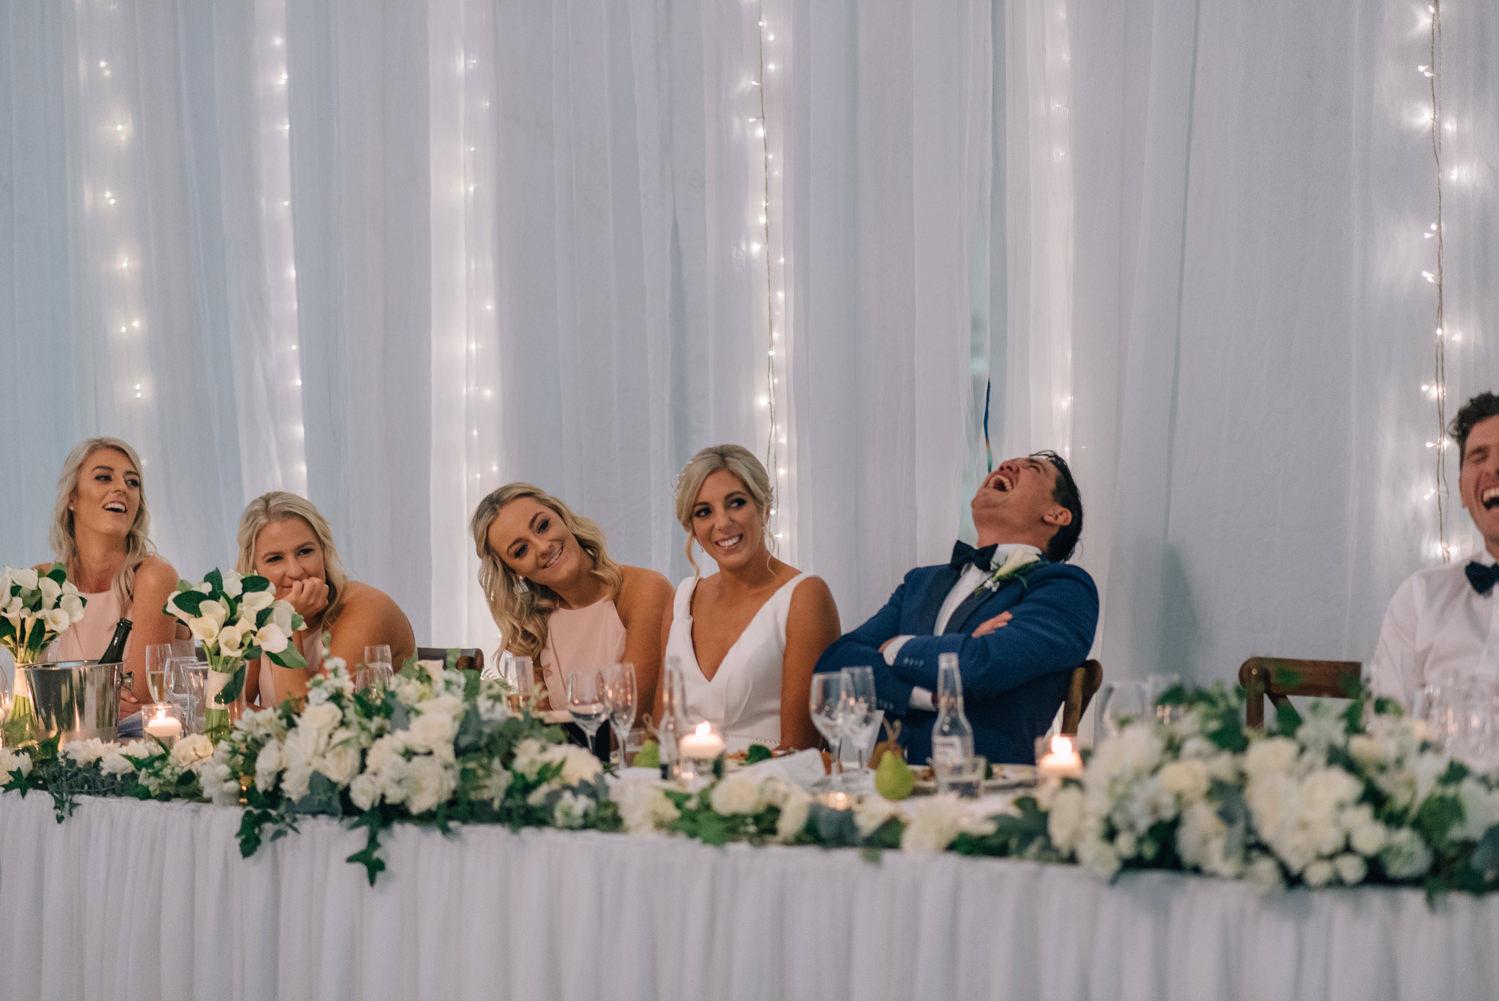 Entally-House-Wedding-Photographer-104.jpg